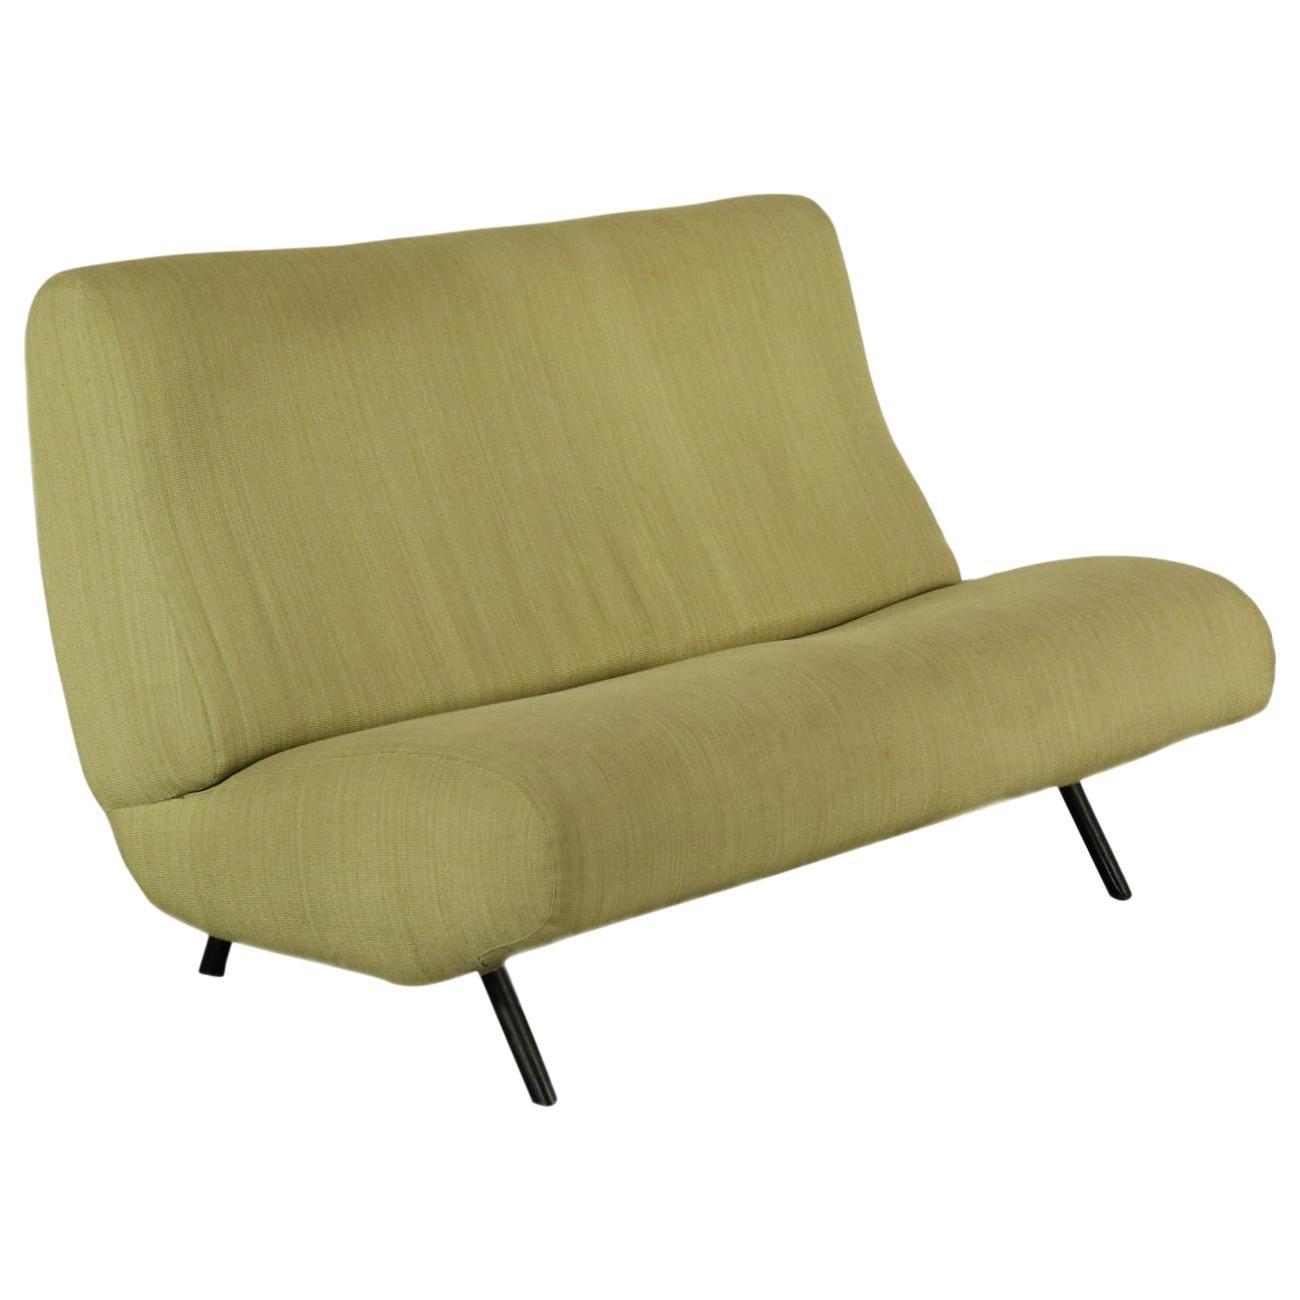 Sofa Foam, Fabric and Brass Marco Zanuso, 1960s